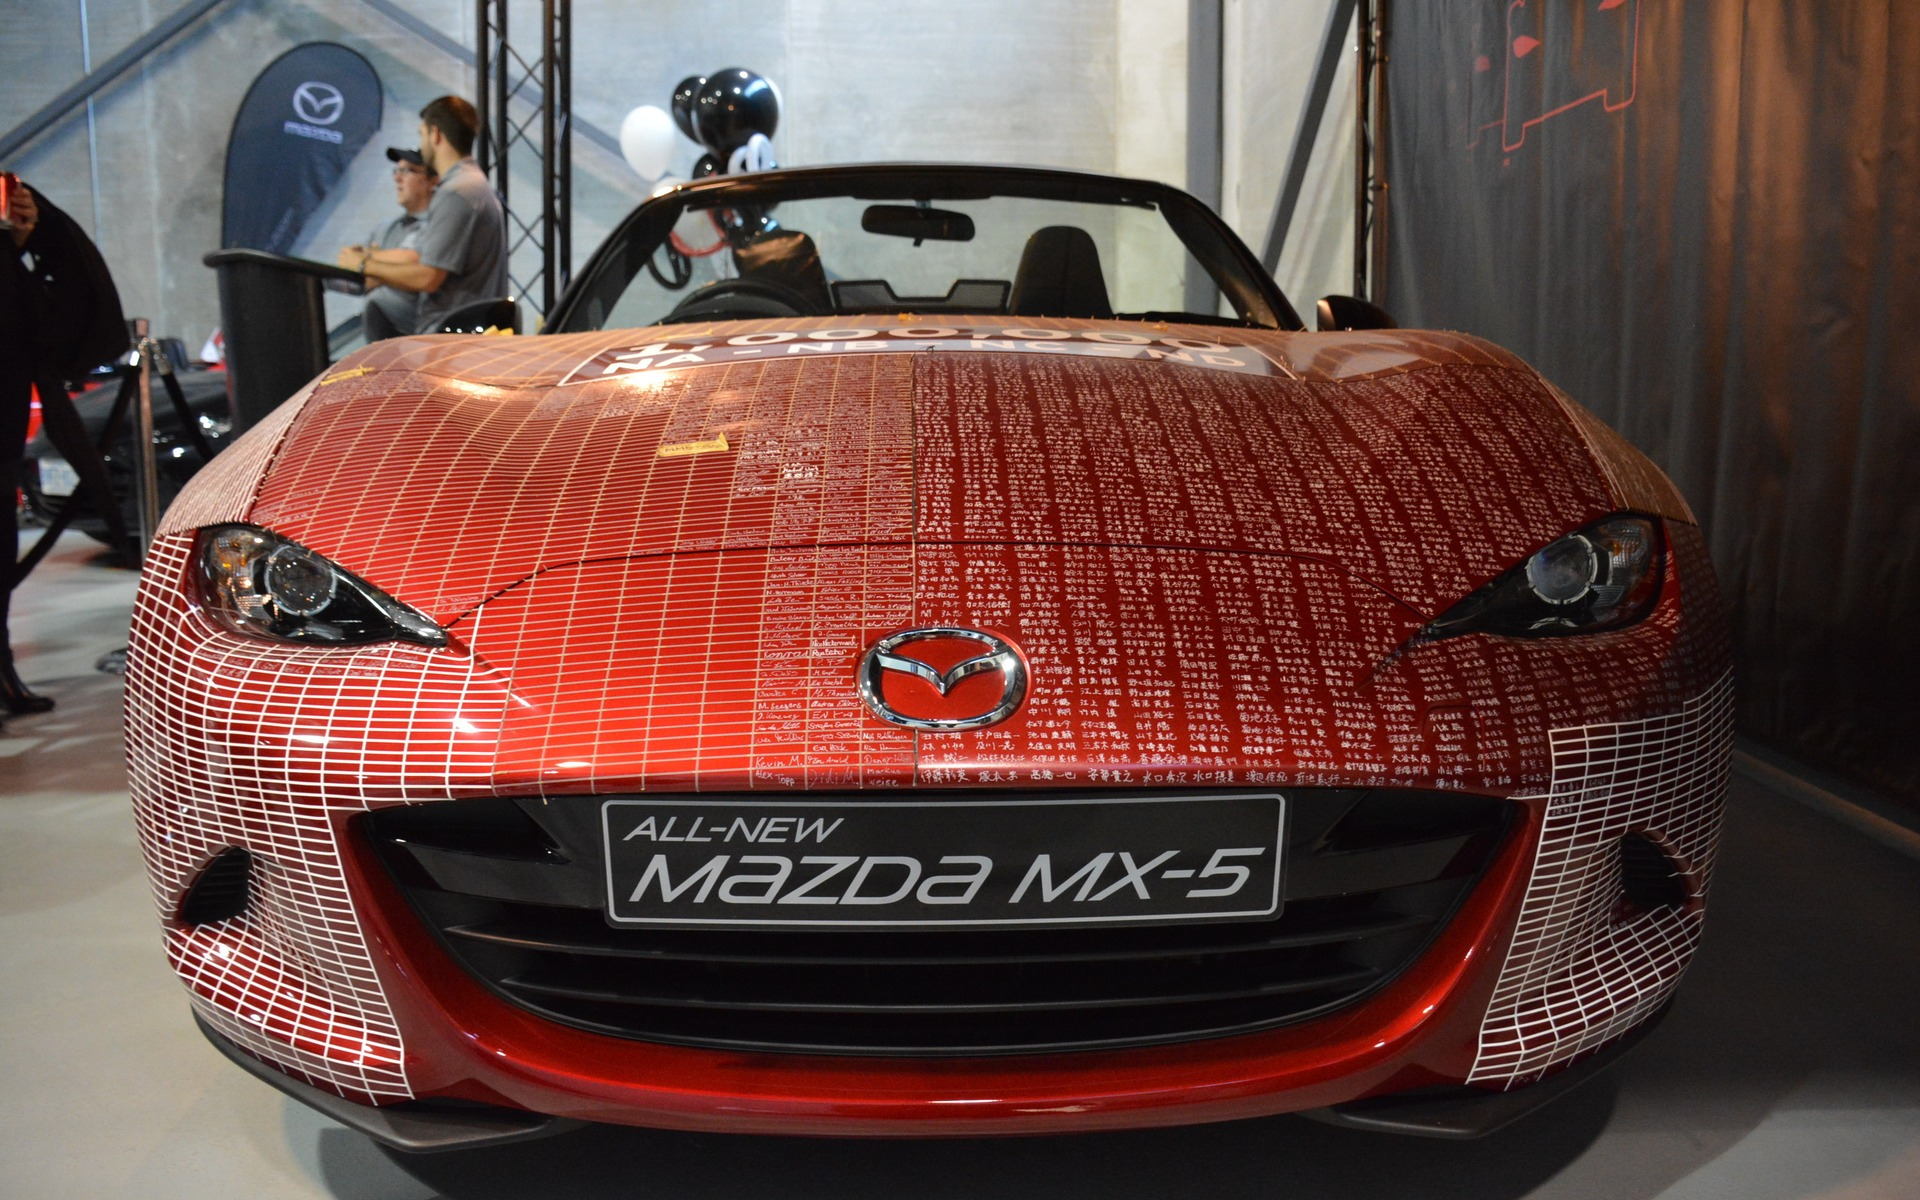 Millionth Mazda MX-5 Celebration Tour